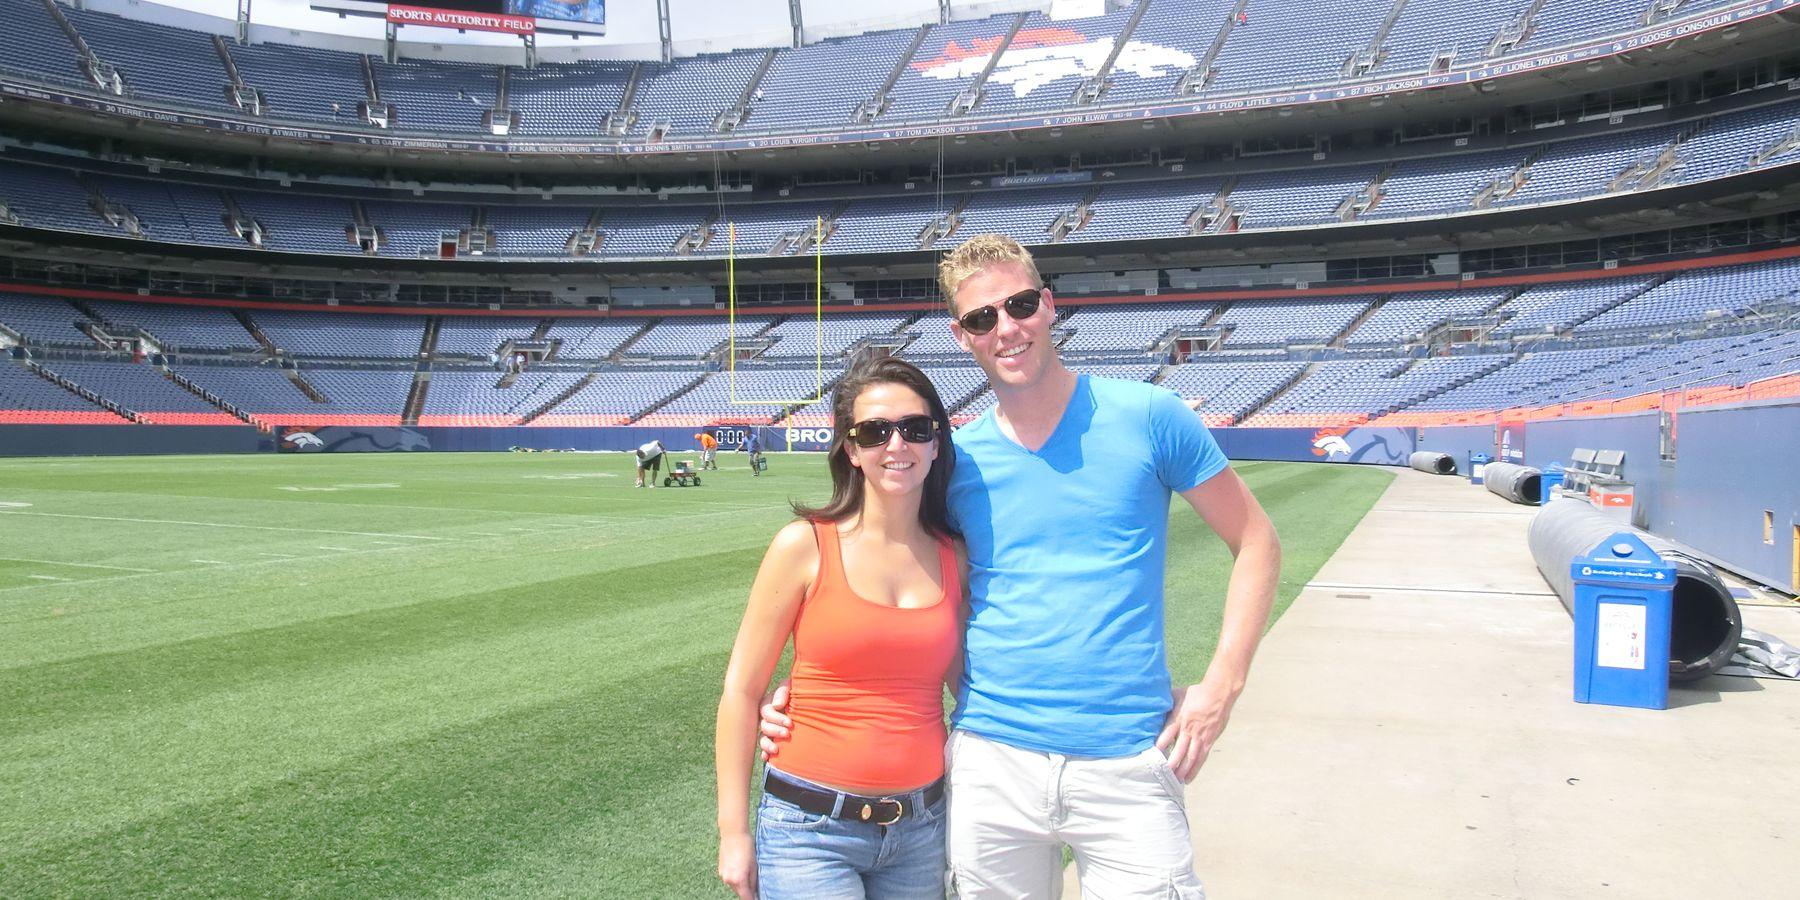 Sports Authority Field, thuisbasis van de Denver Bronco's in Denver, Colorado